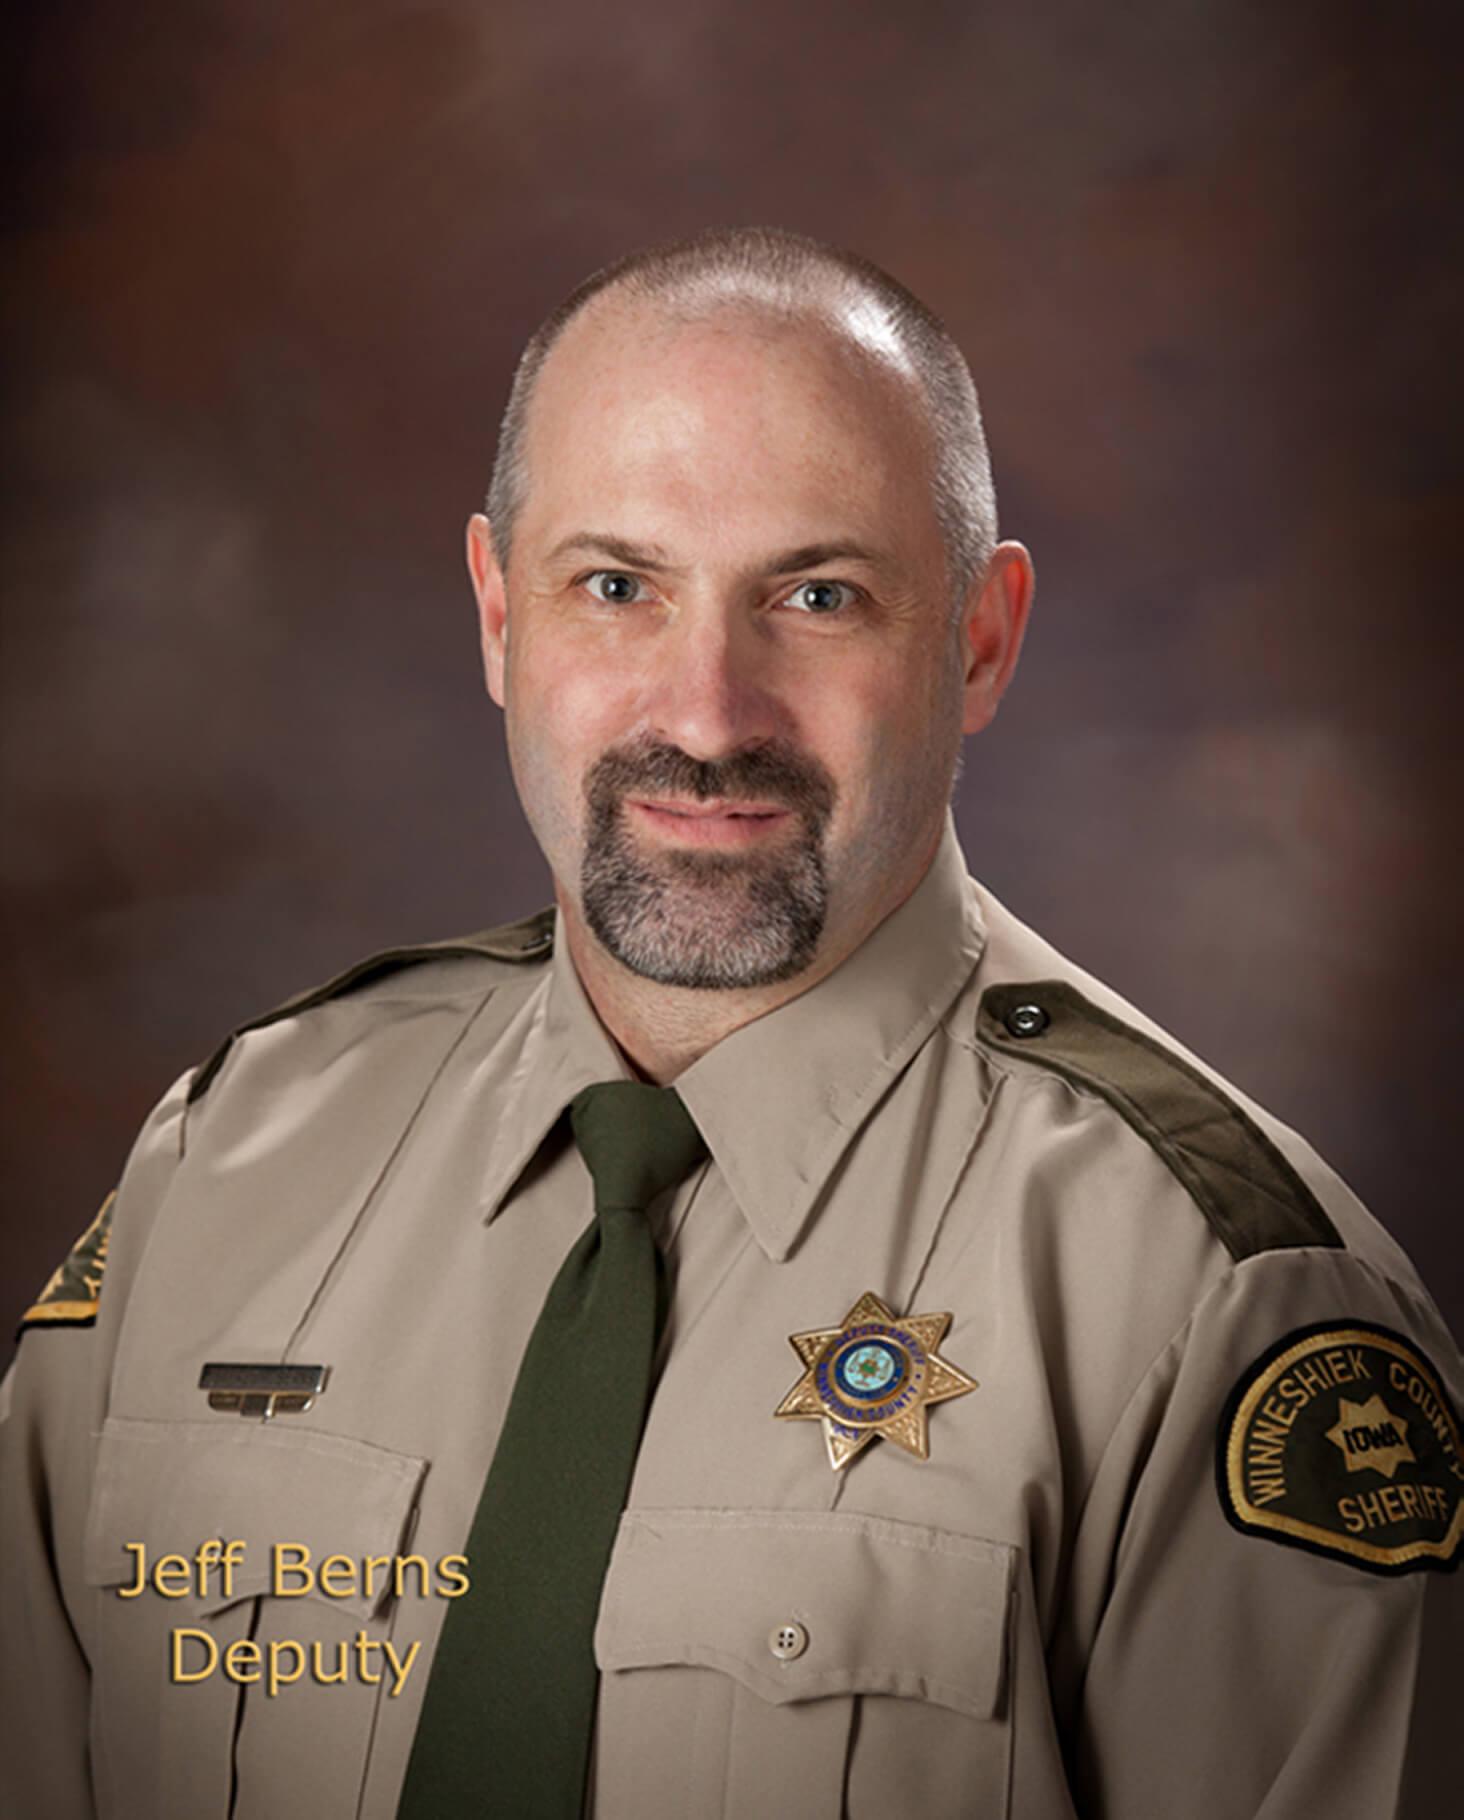 Jeff Berns, Chief Deputy